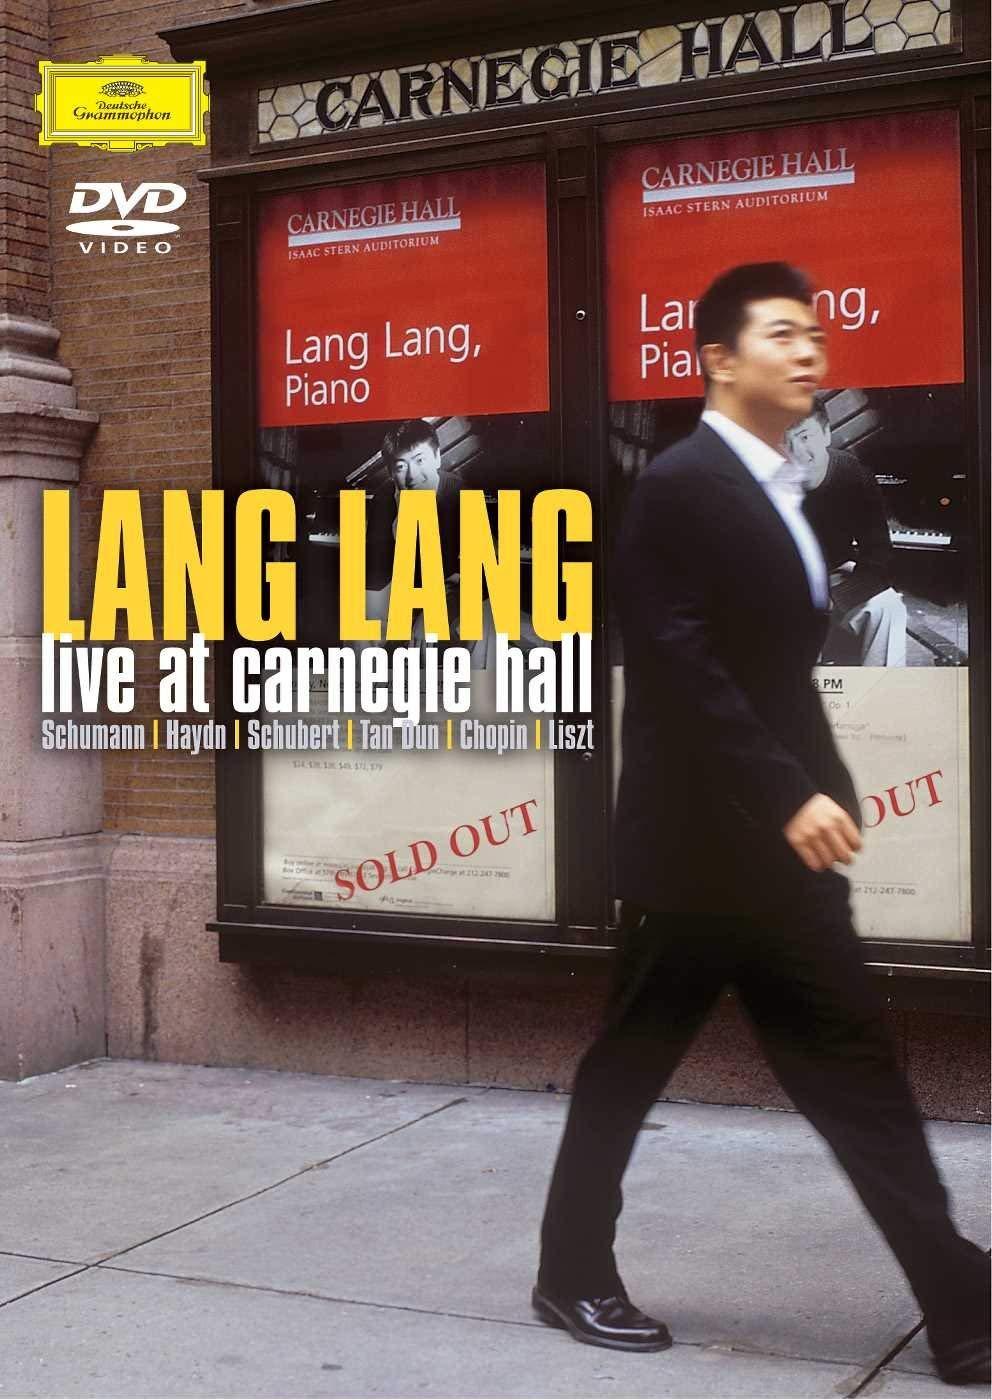 LANG LANG LIVE AT CARNEGIE HALL (DVD)